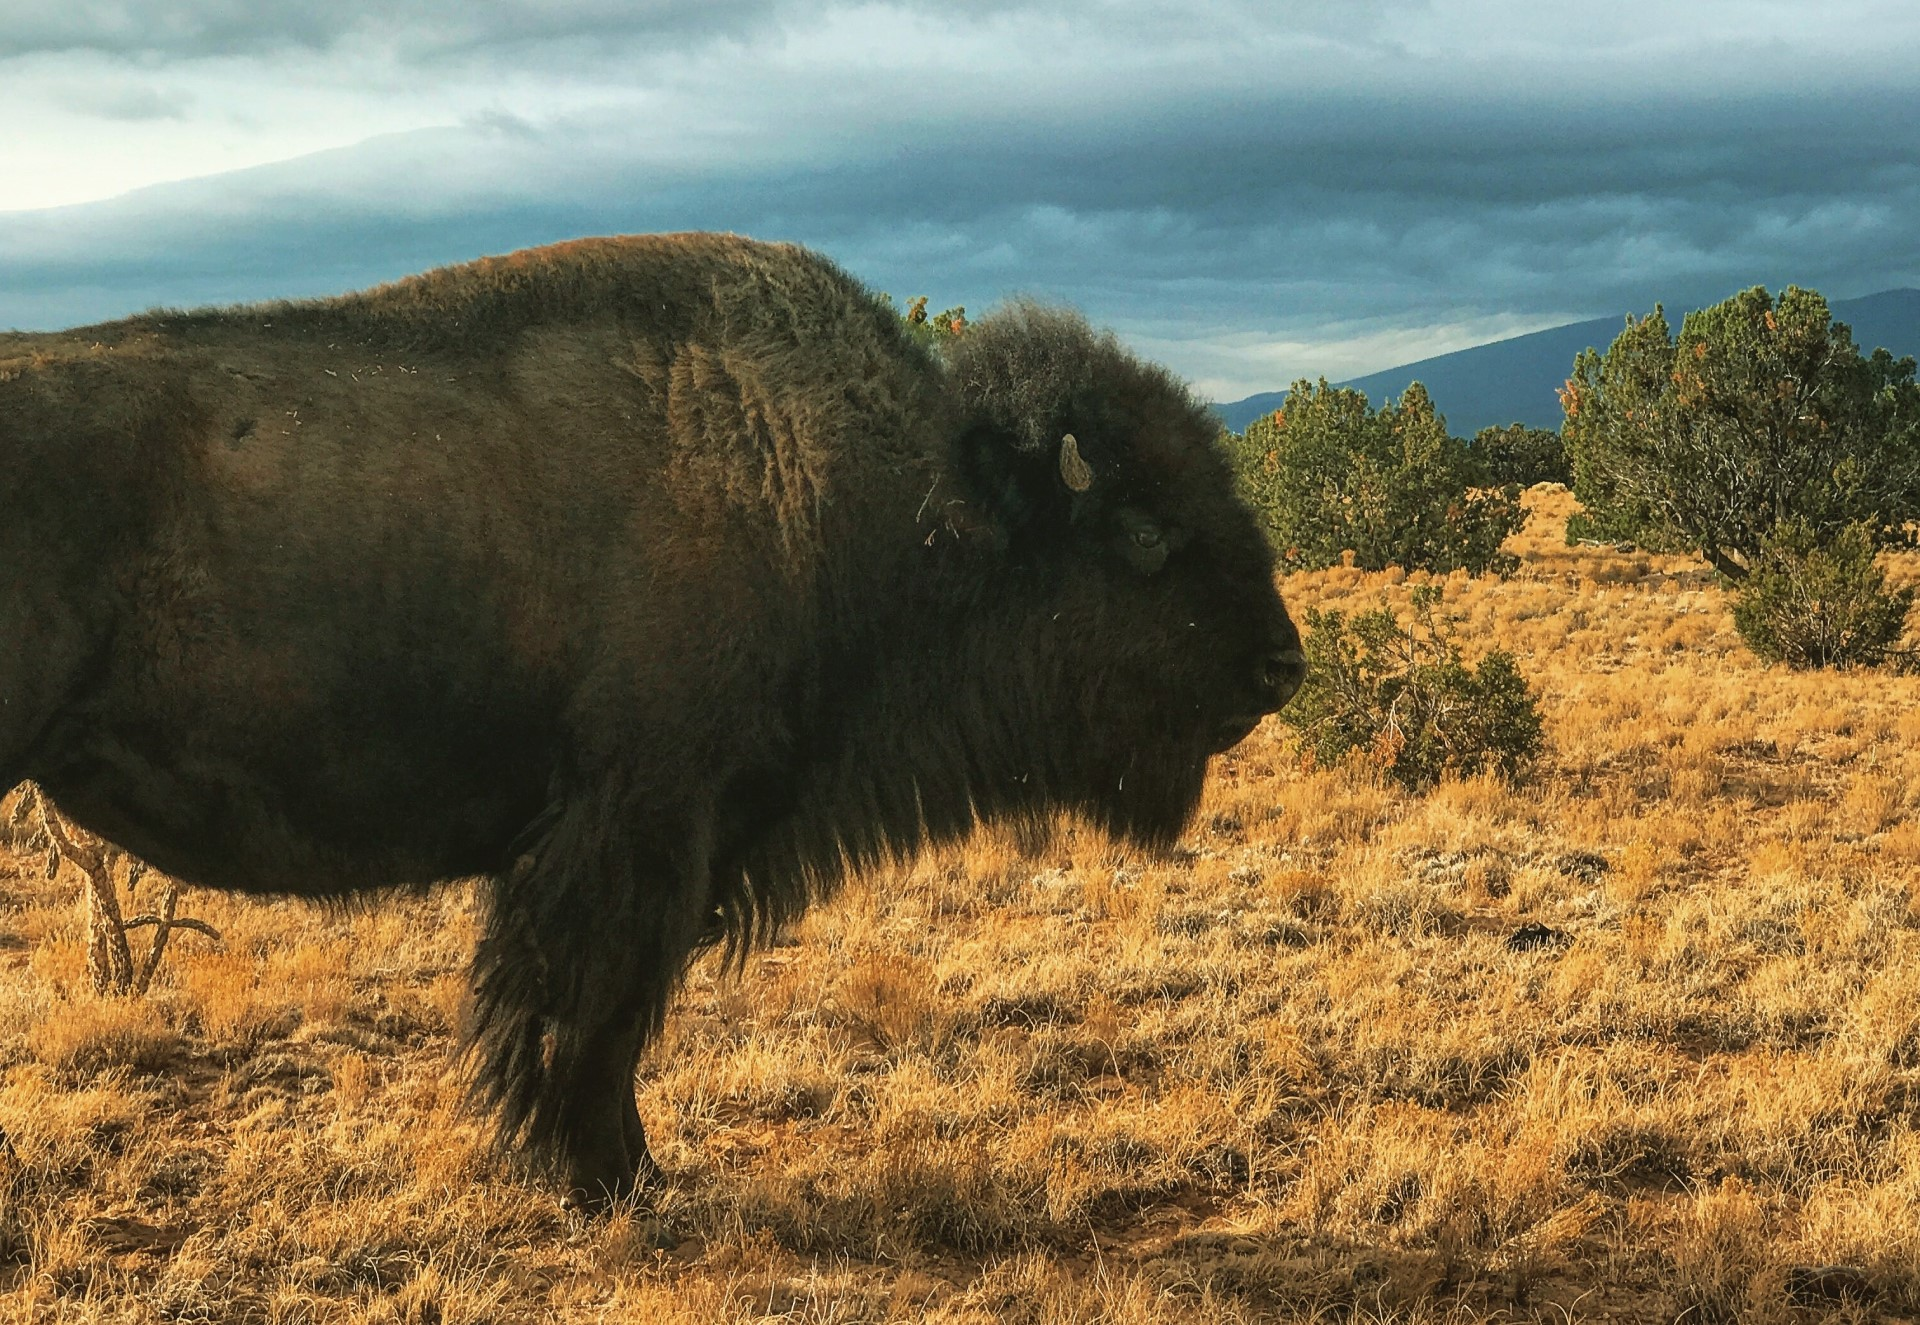 SPOTLIGHT on the American Bison